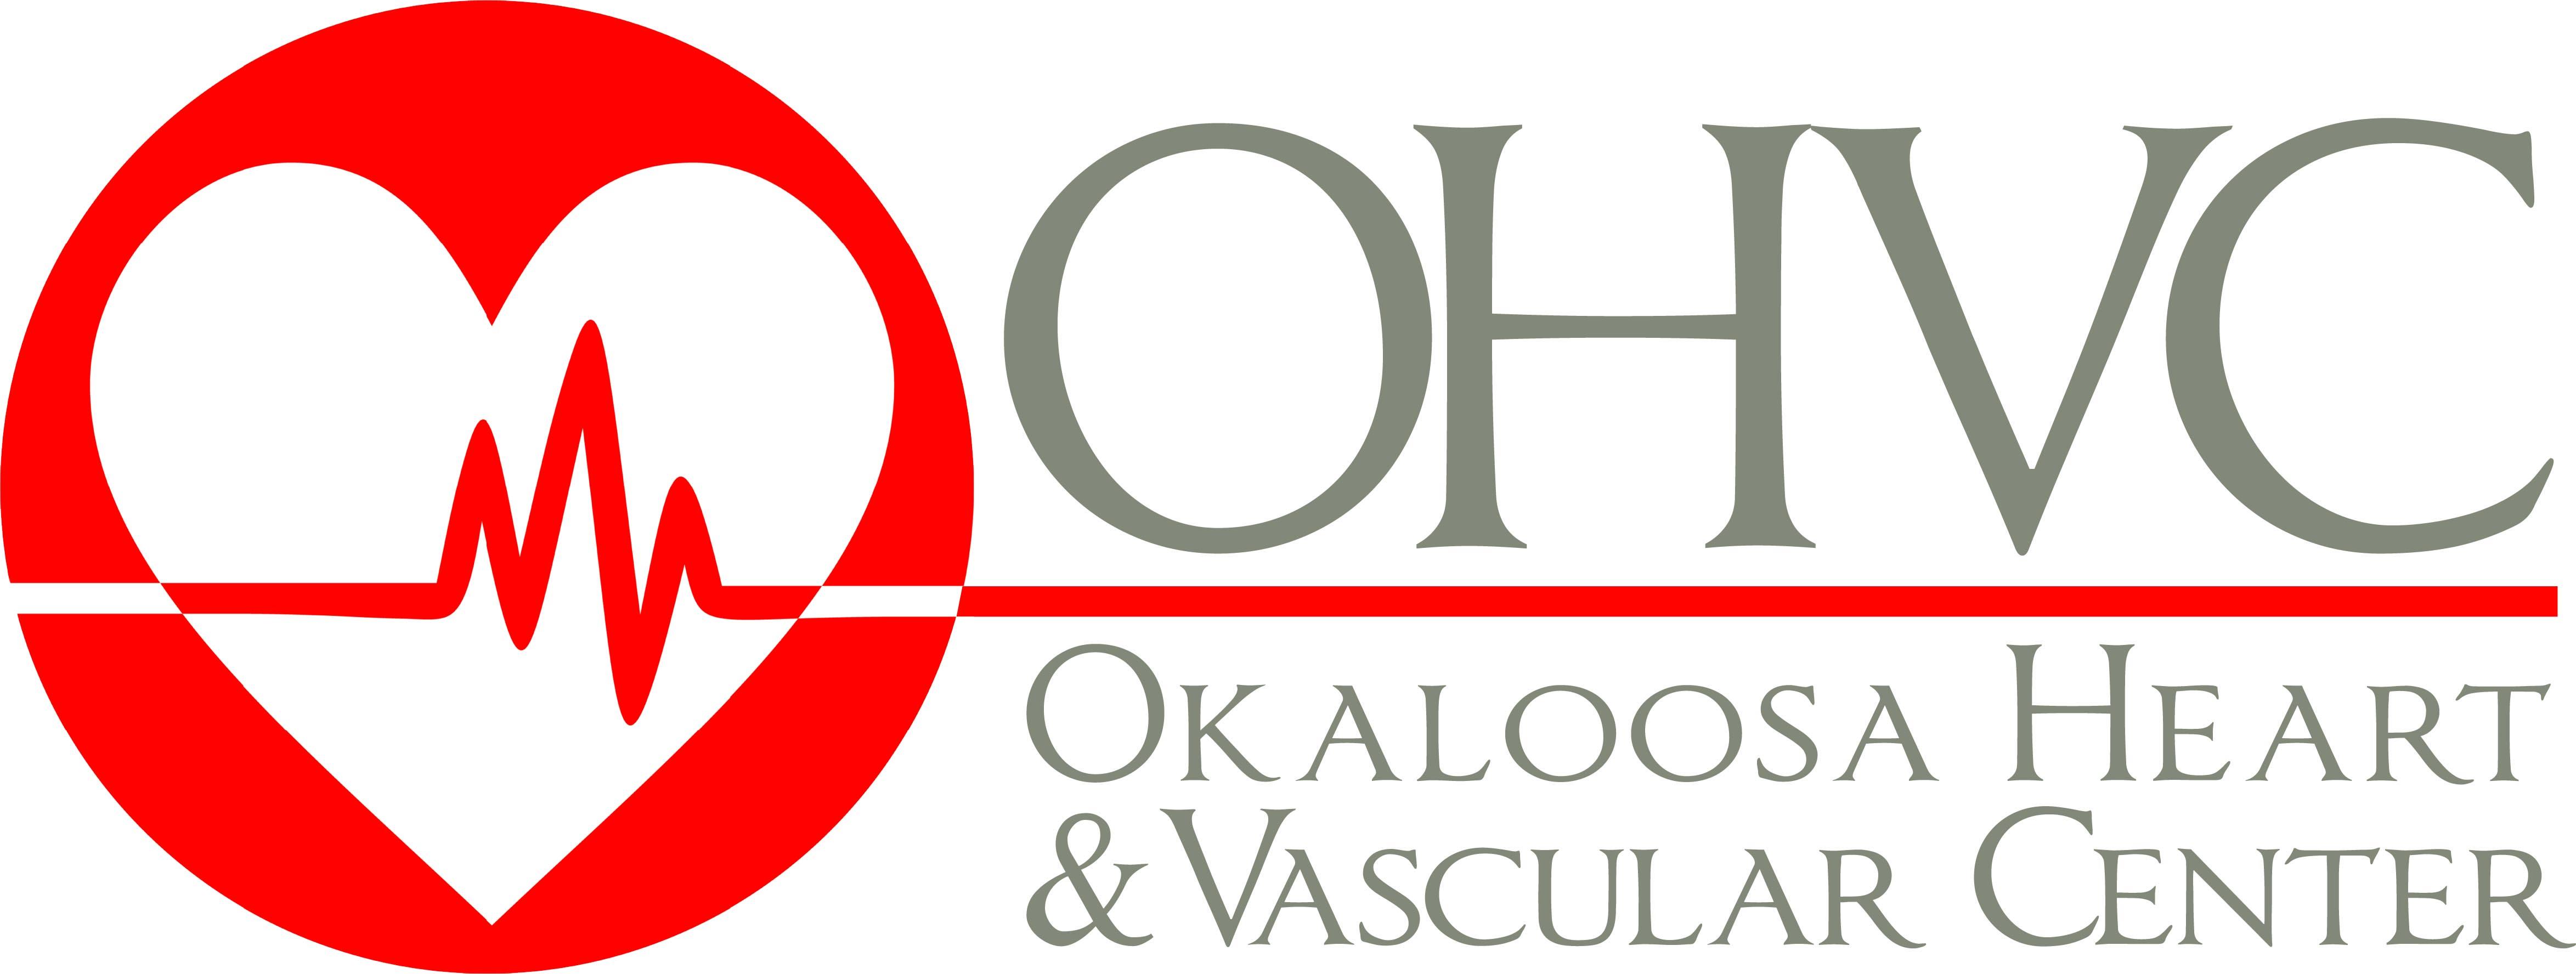 Okaloosa Heart & Vascular Center